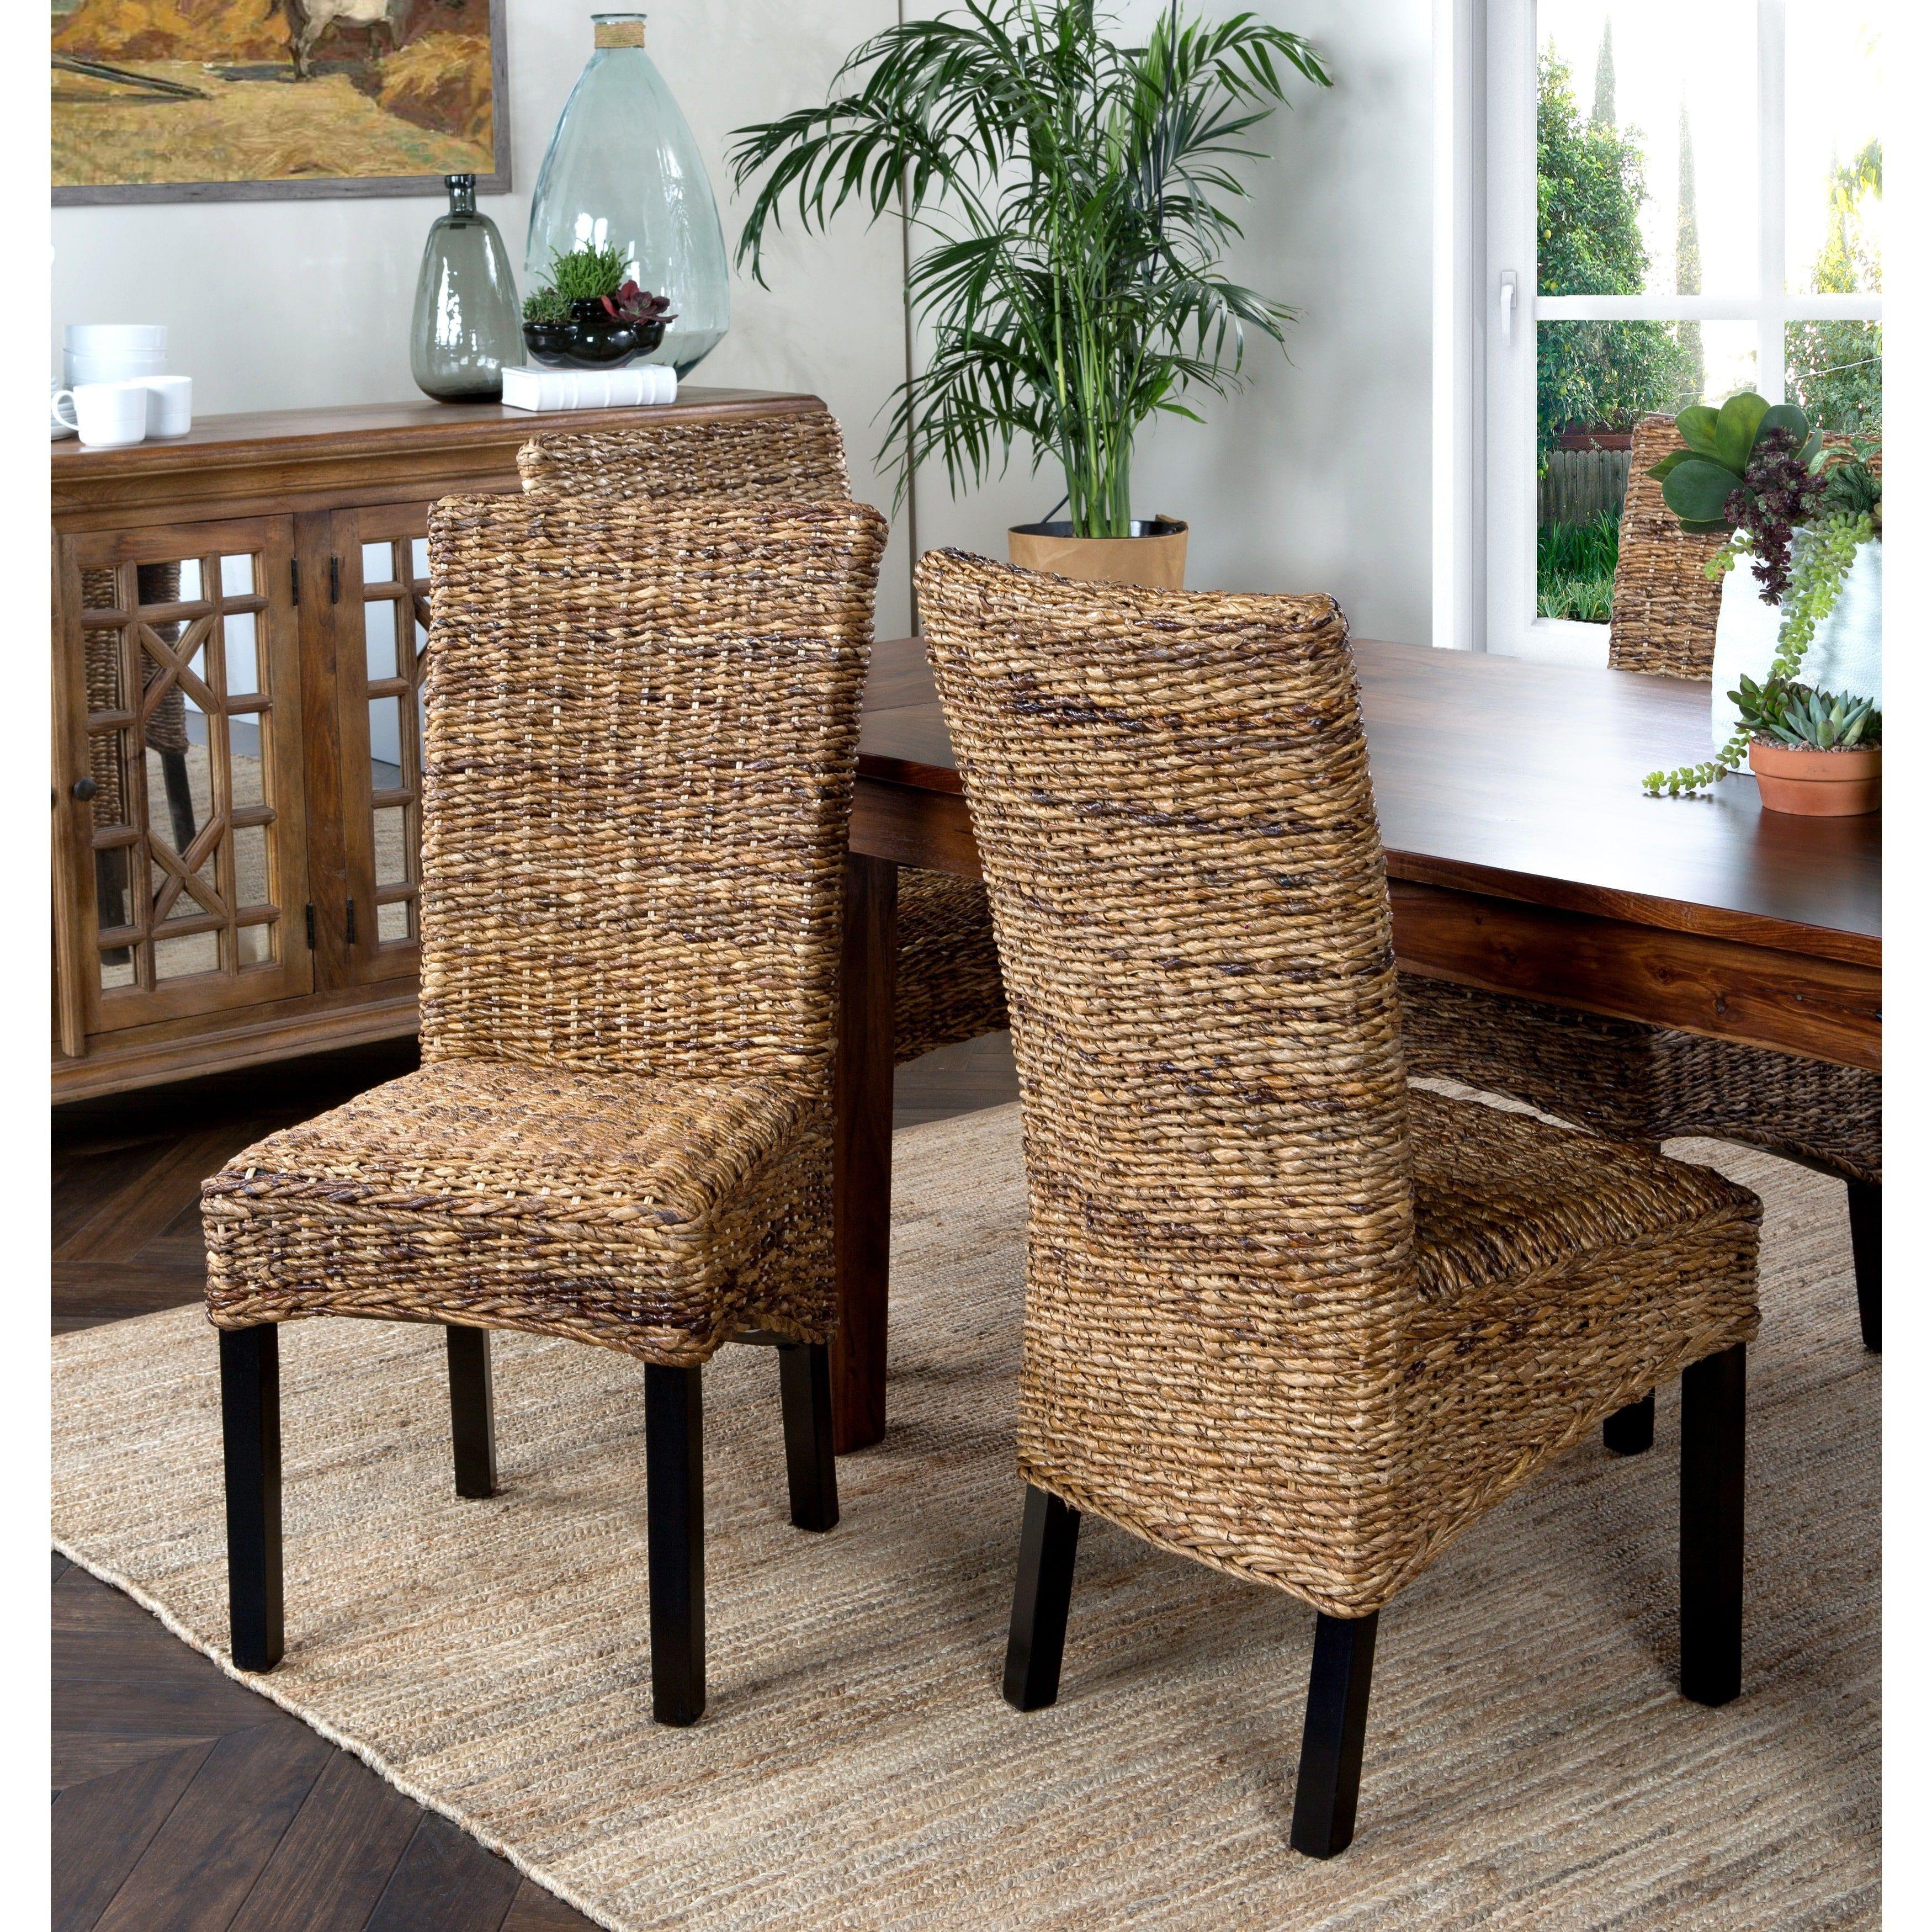 Pine Canopy Inyo Rattan Dining Chair Handmade Brown